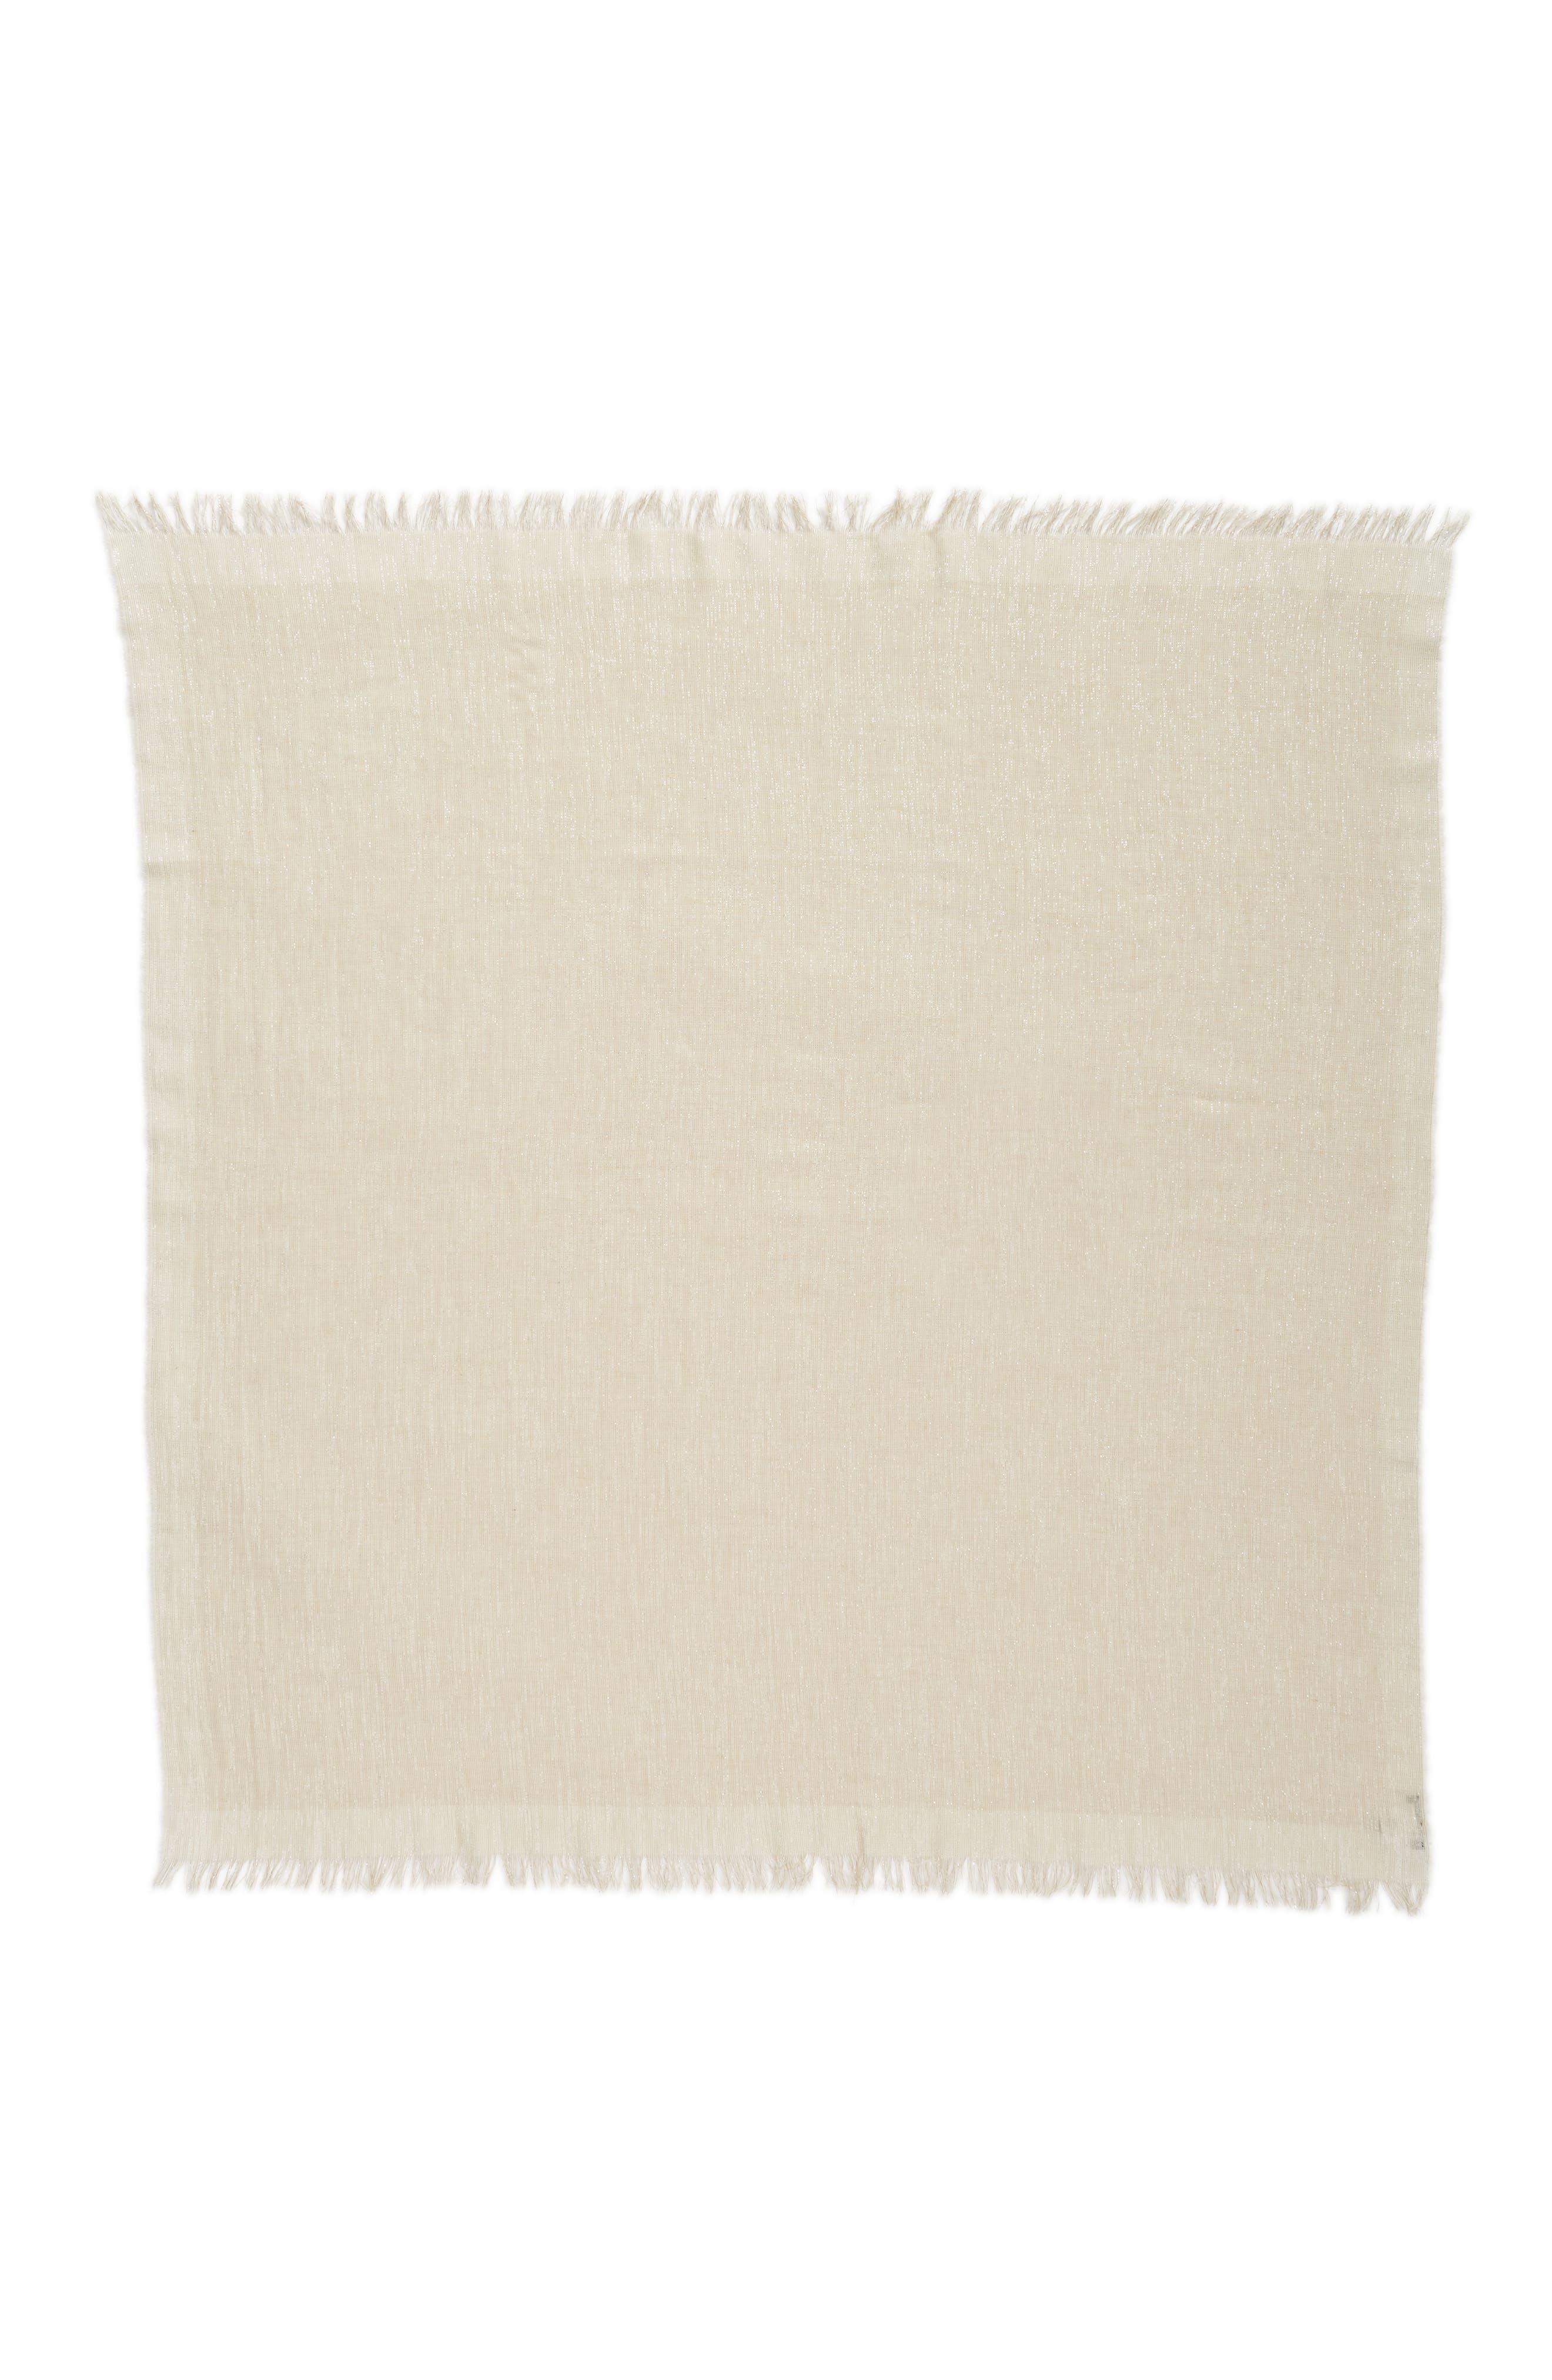 Organic Cotton Blend Wrap,                             Alternate thumbnail 3, color,                             Natural